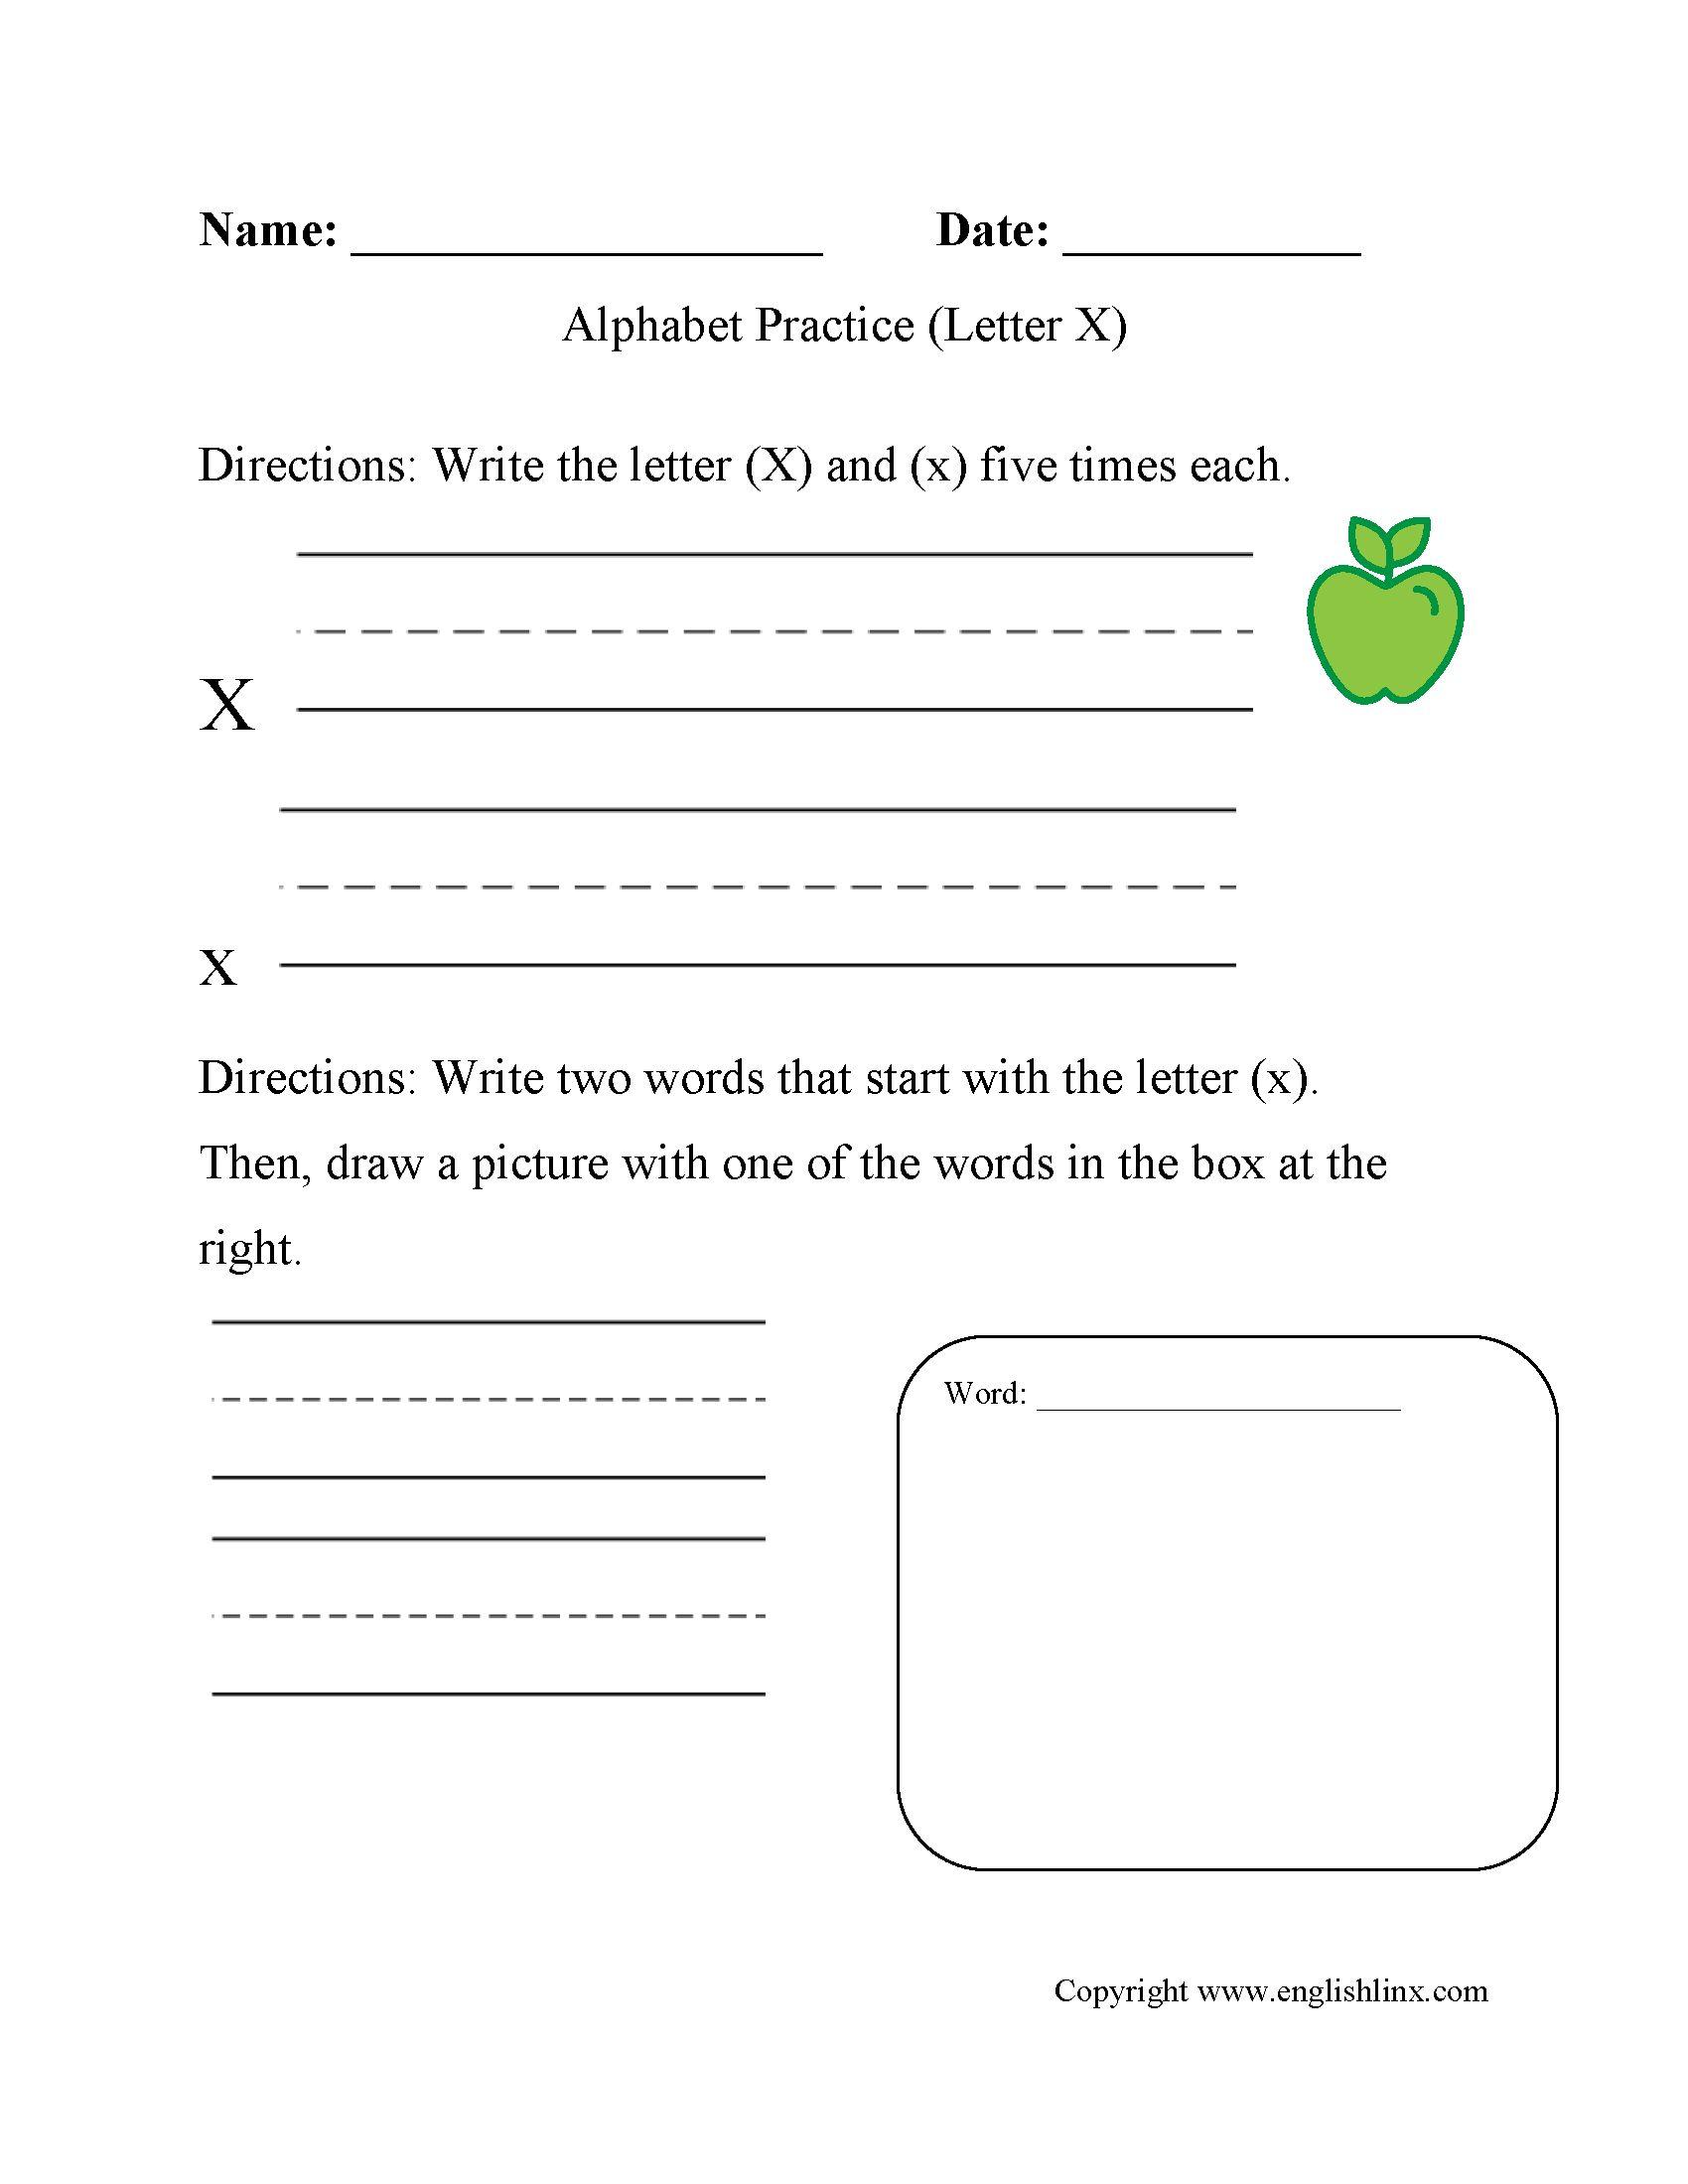 Name Writing Practice Worksheets